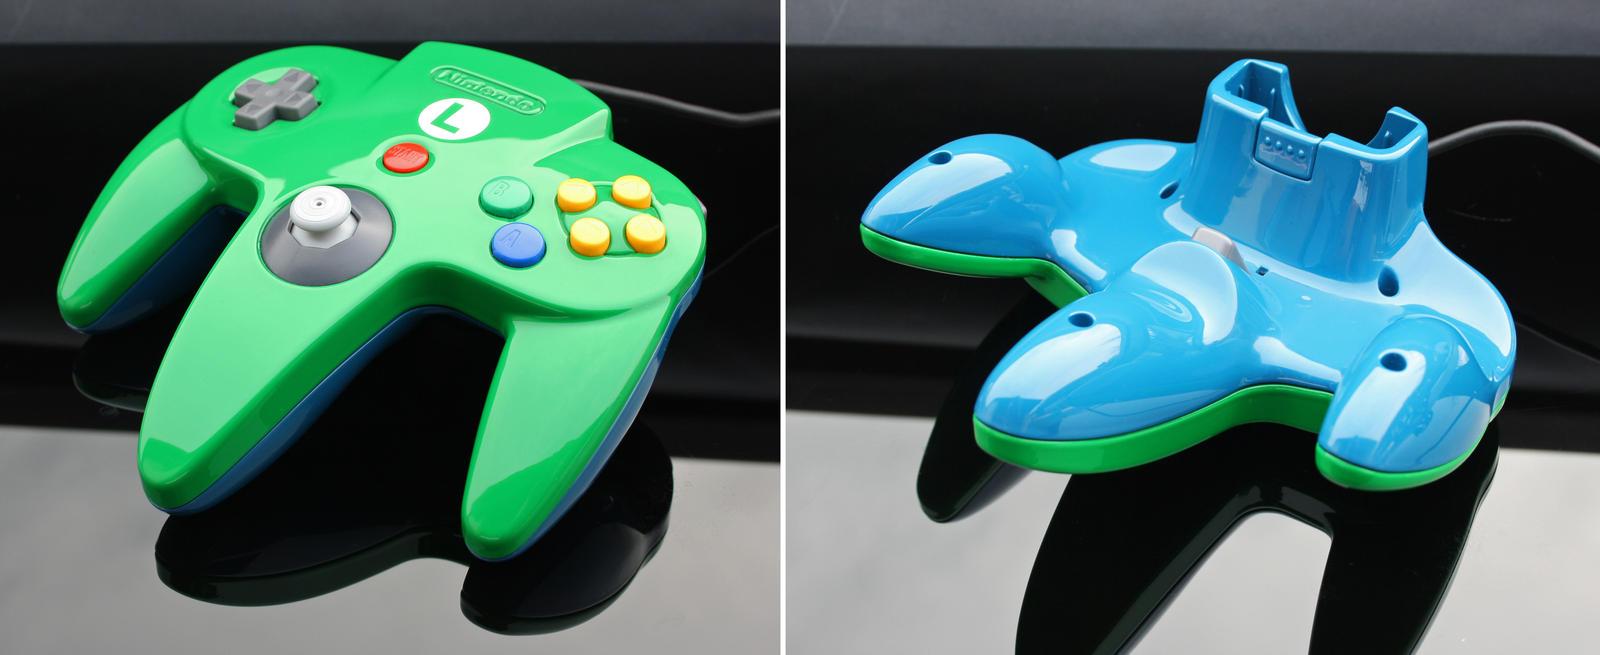 Custom Luigi N64 controller by Zoki64